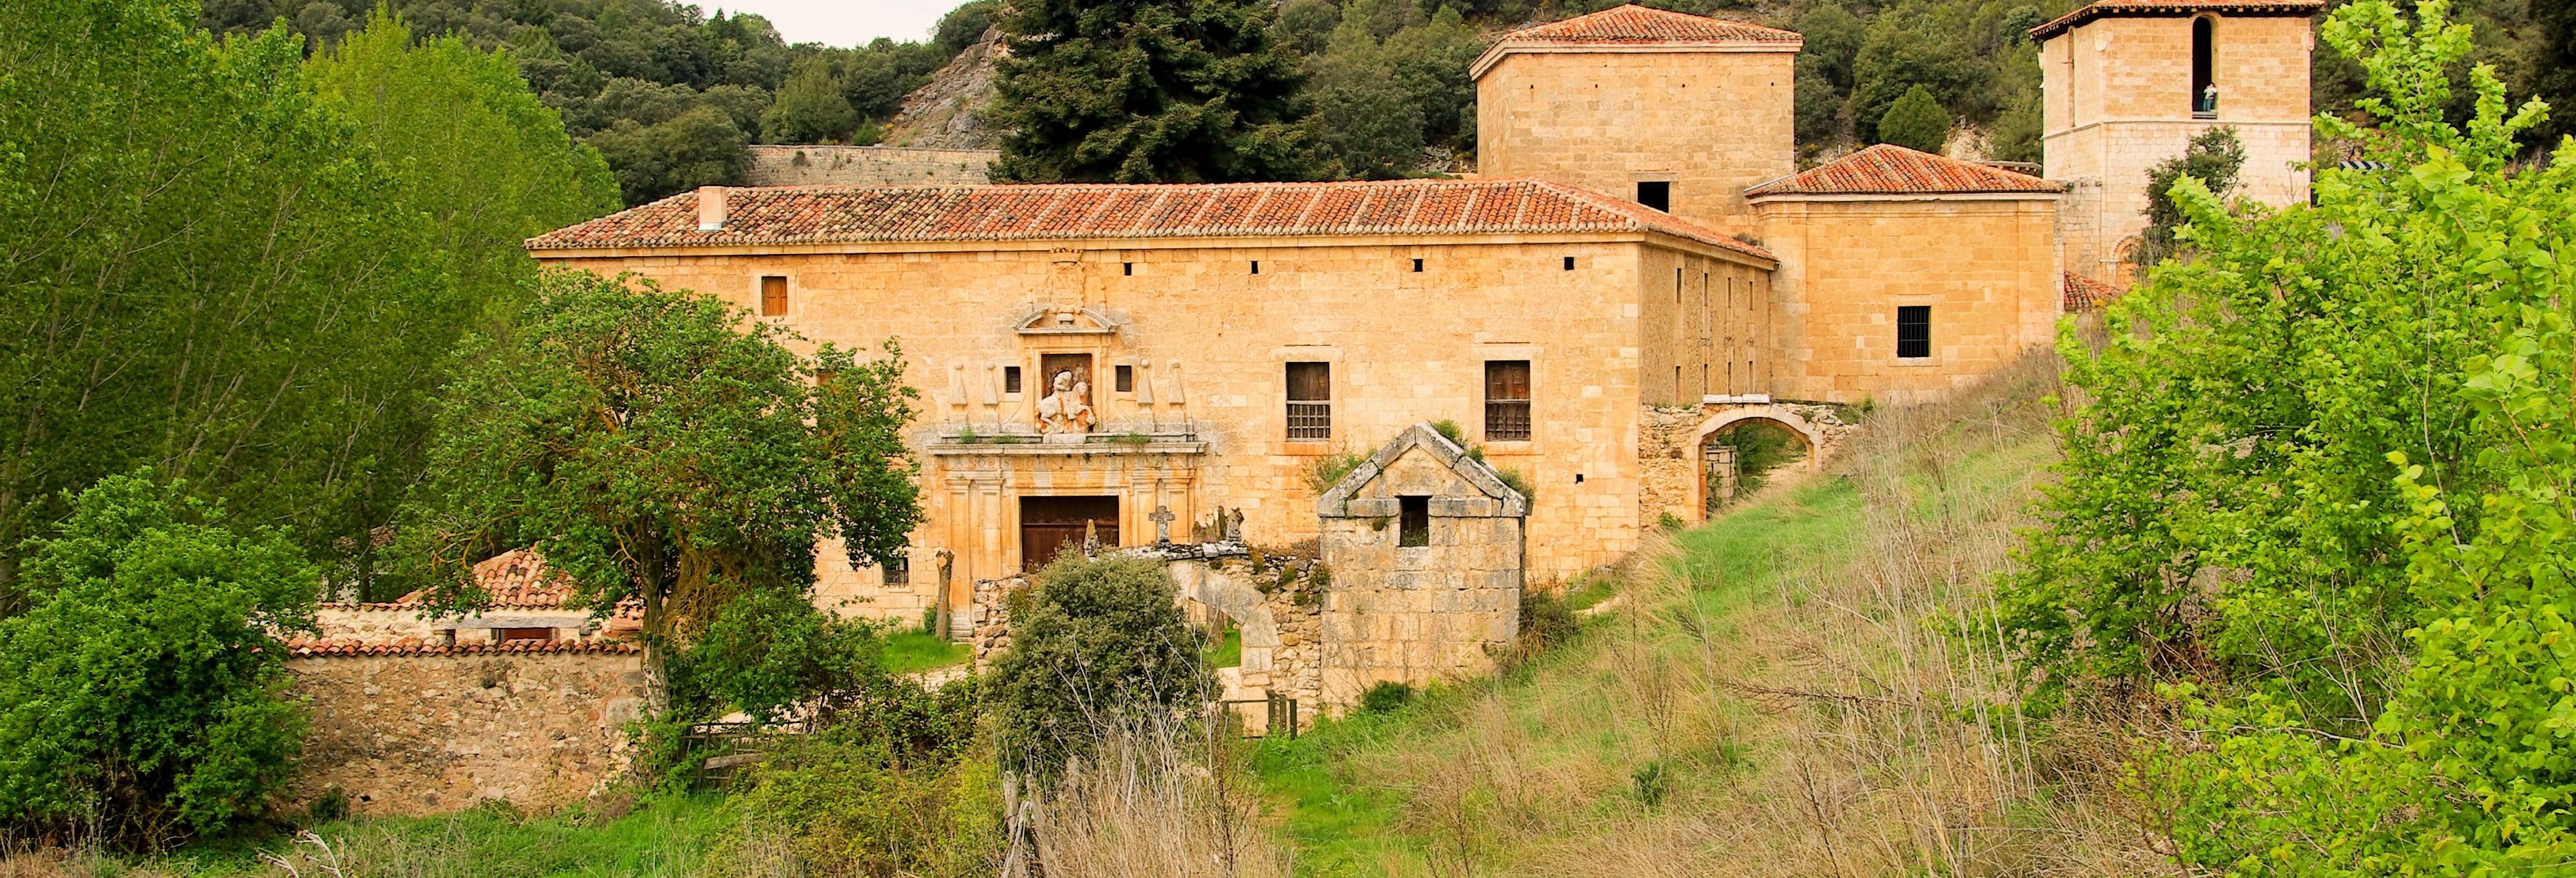 Arlanza Comarca